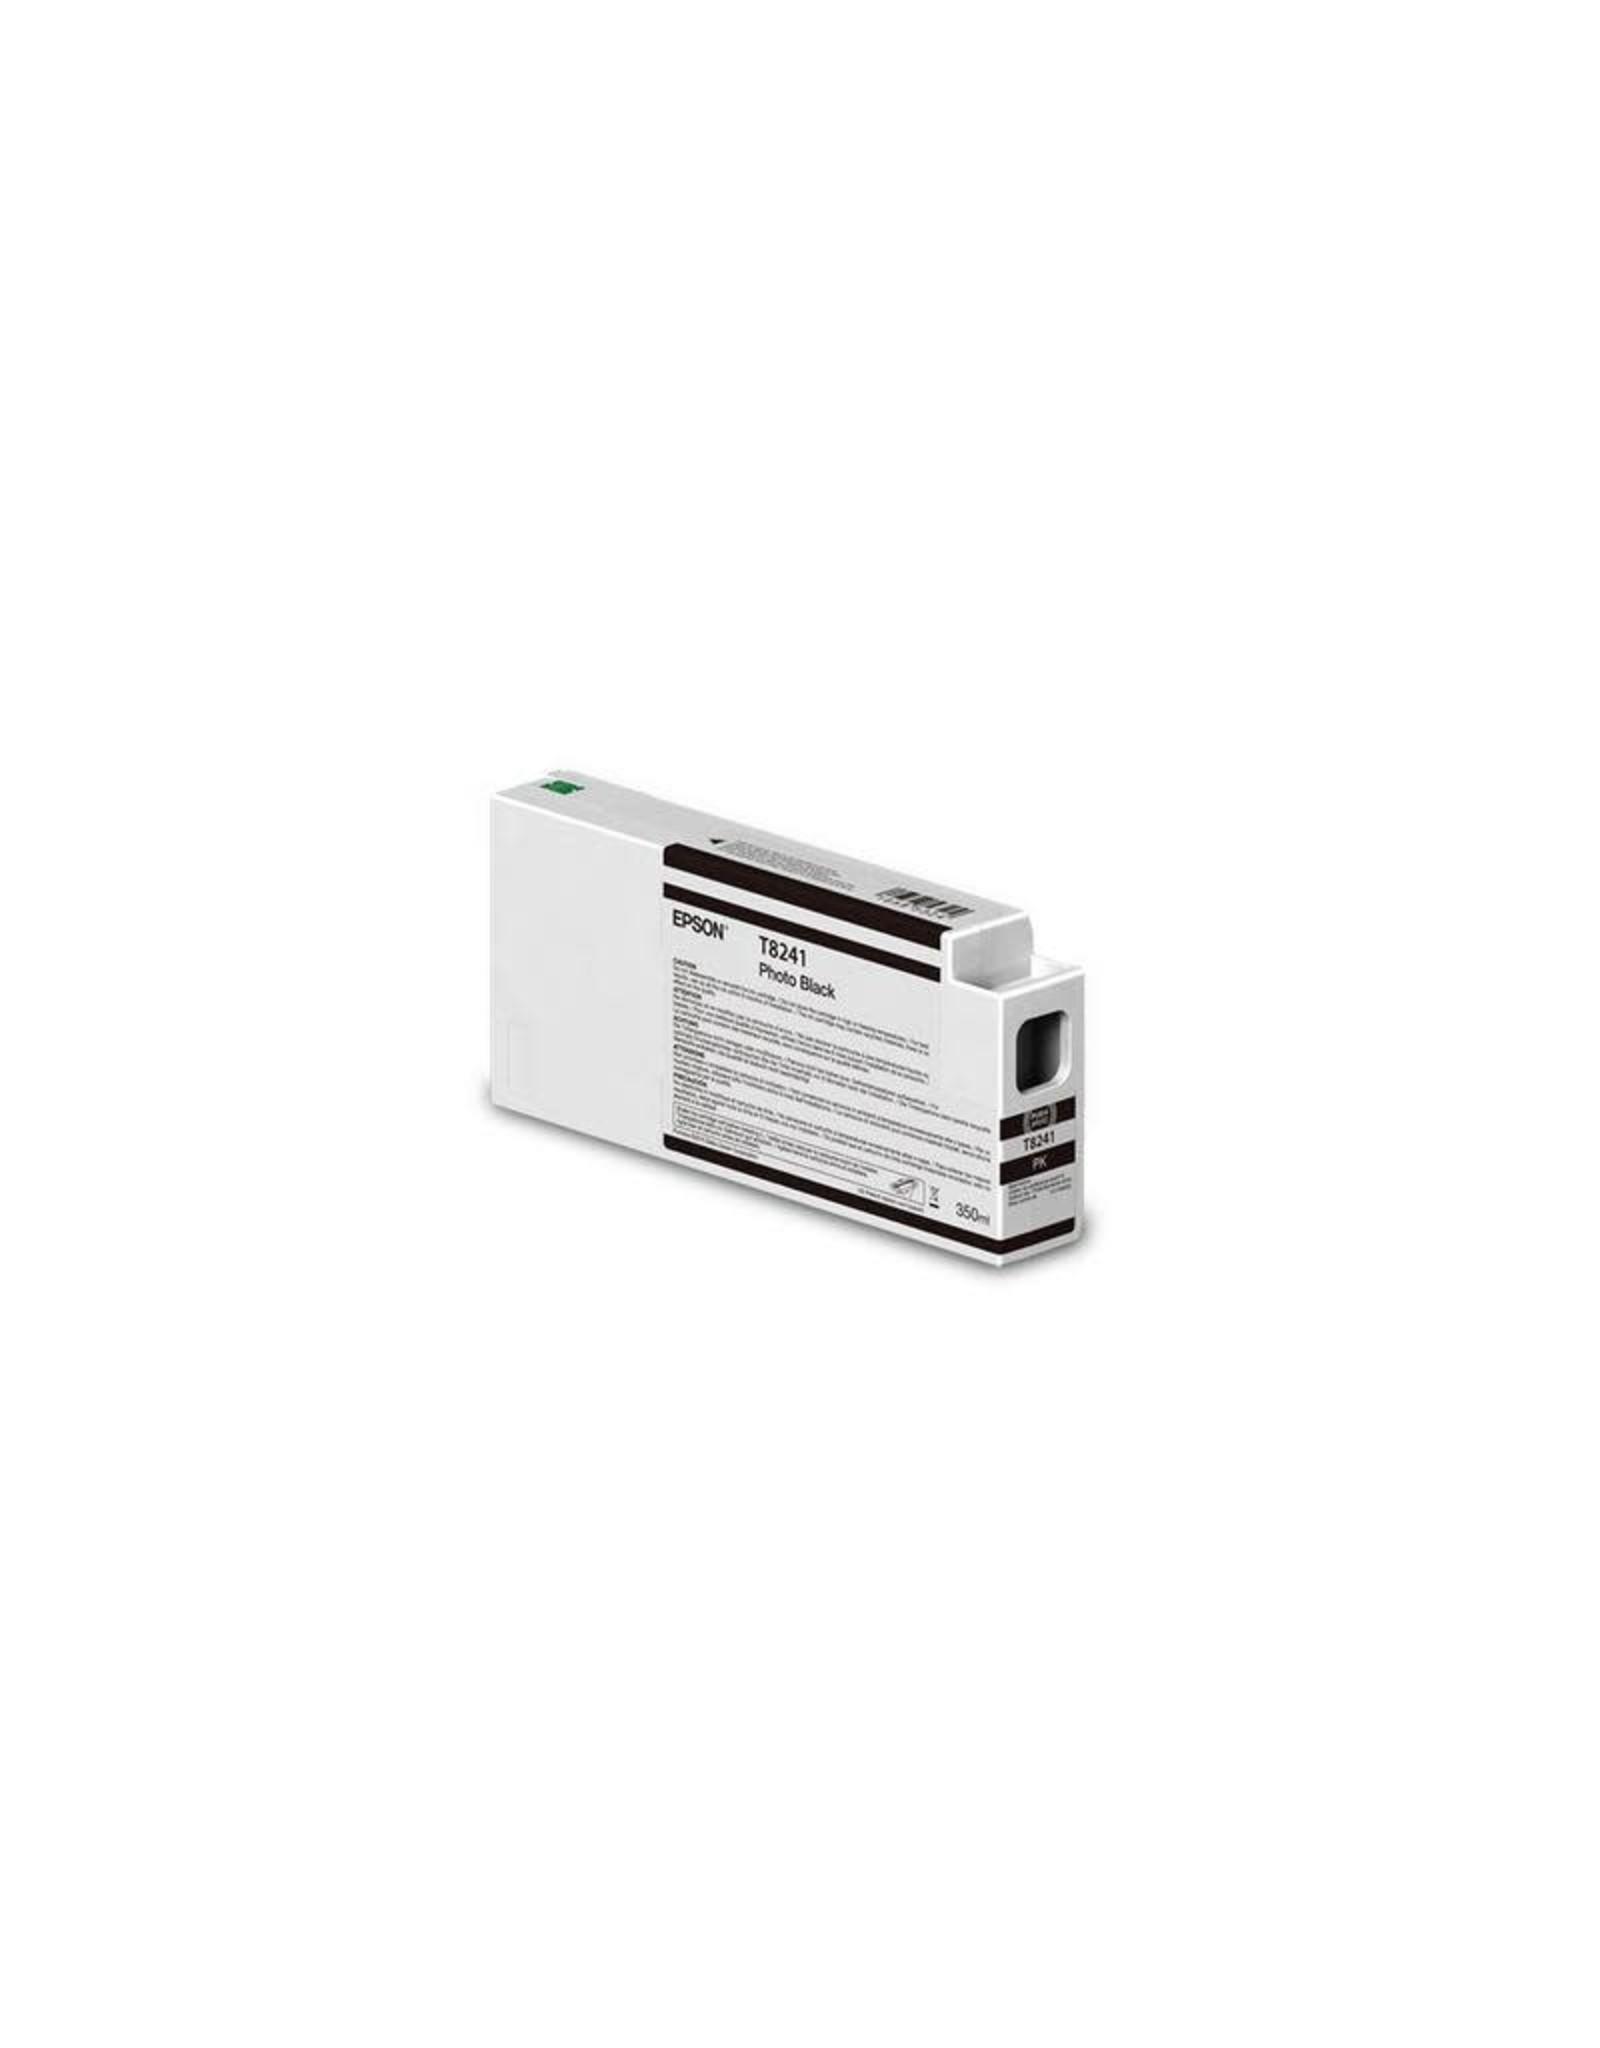 Epson Epson Ultrachrome HD Photo BLK Ink 350ML for SC-P7000/9000